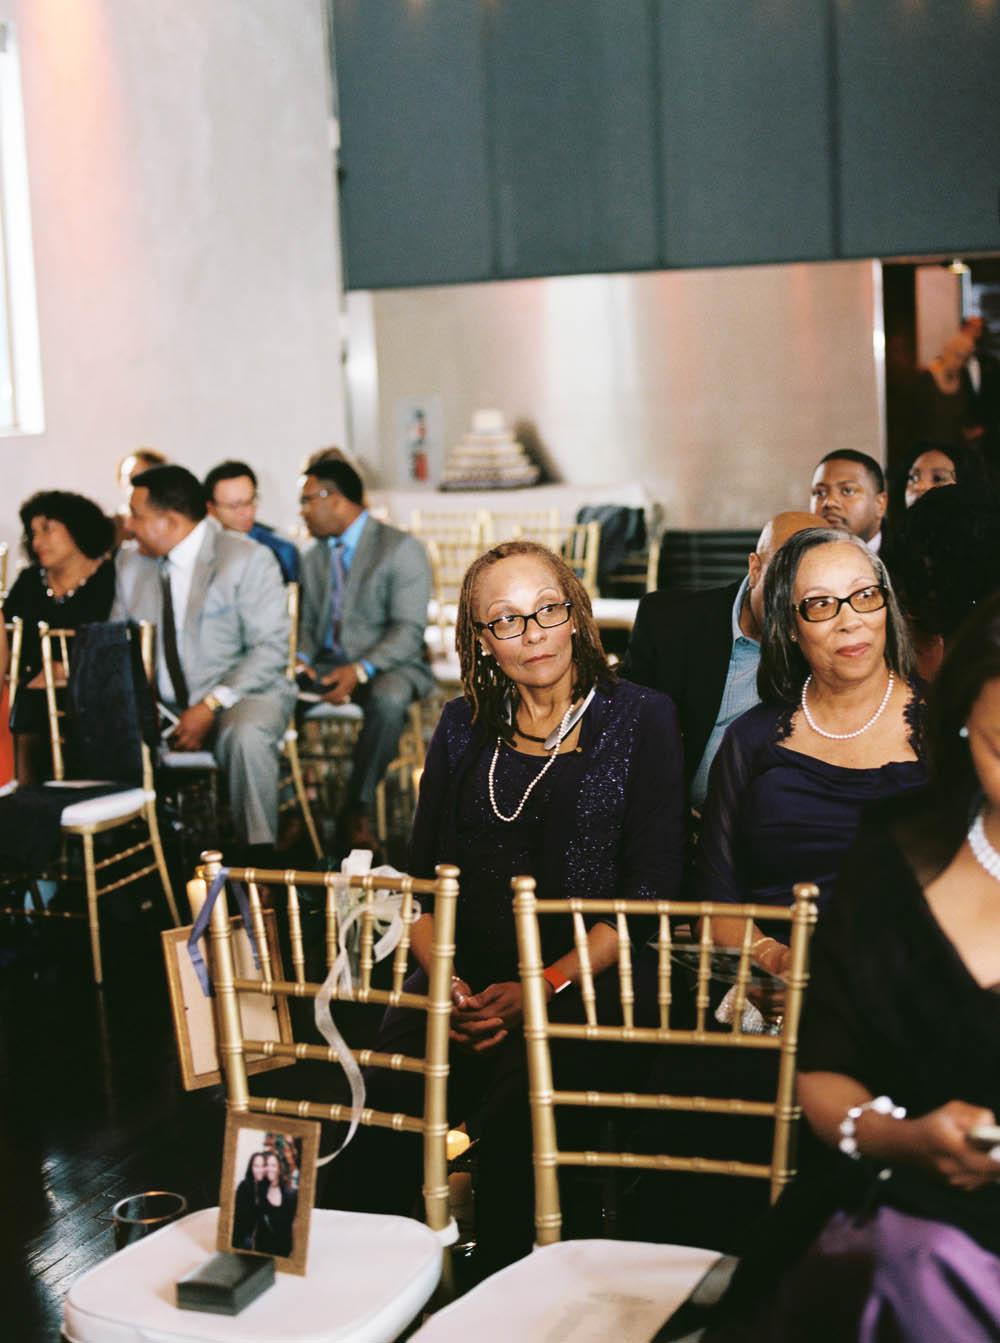 nashville ruby film documentary wedding photographer heartfelt real moments african american wedding munalachi bride ©2016abigailbobophotography-20.jpg